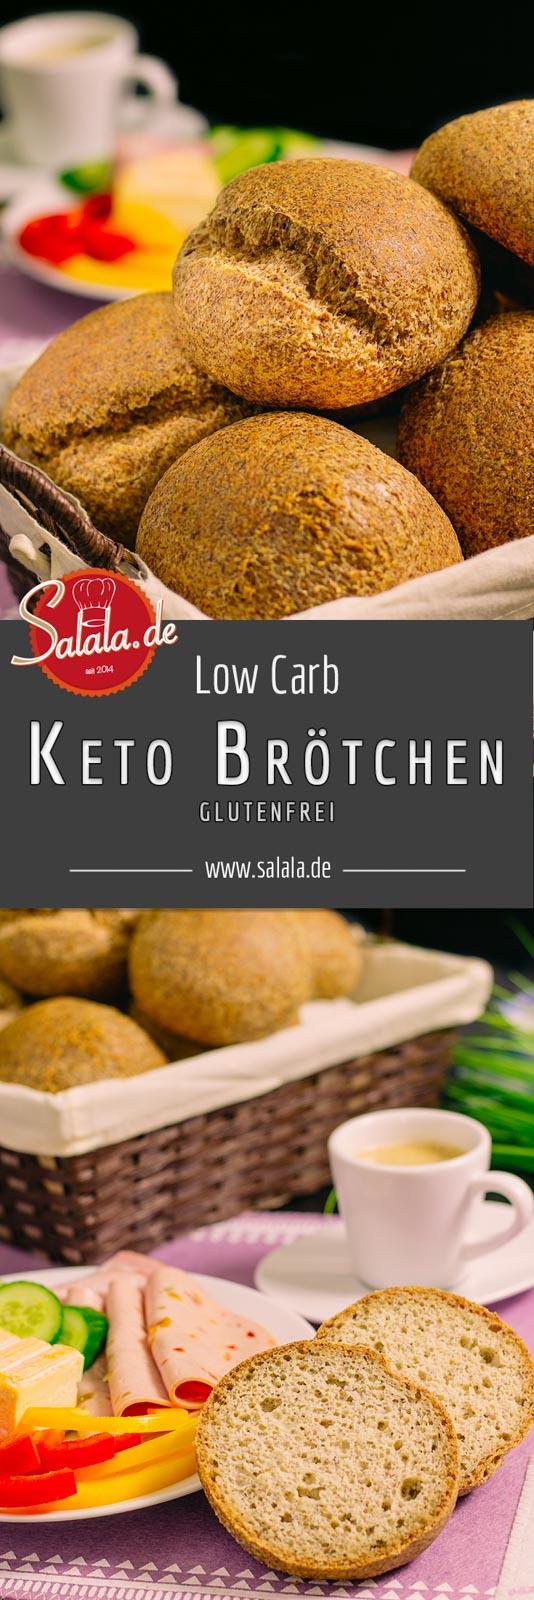 Keto-Brötchen Low Carb backen Sonntags-Semmeln glutenfrei backen - salala.de  #keto #lowcarb #glutenfrei #ketobrötchen #lowcarbbrot